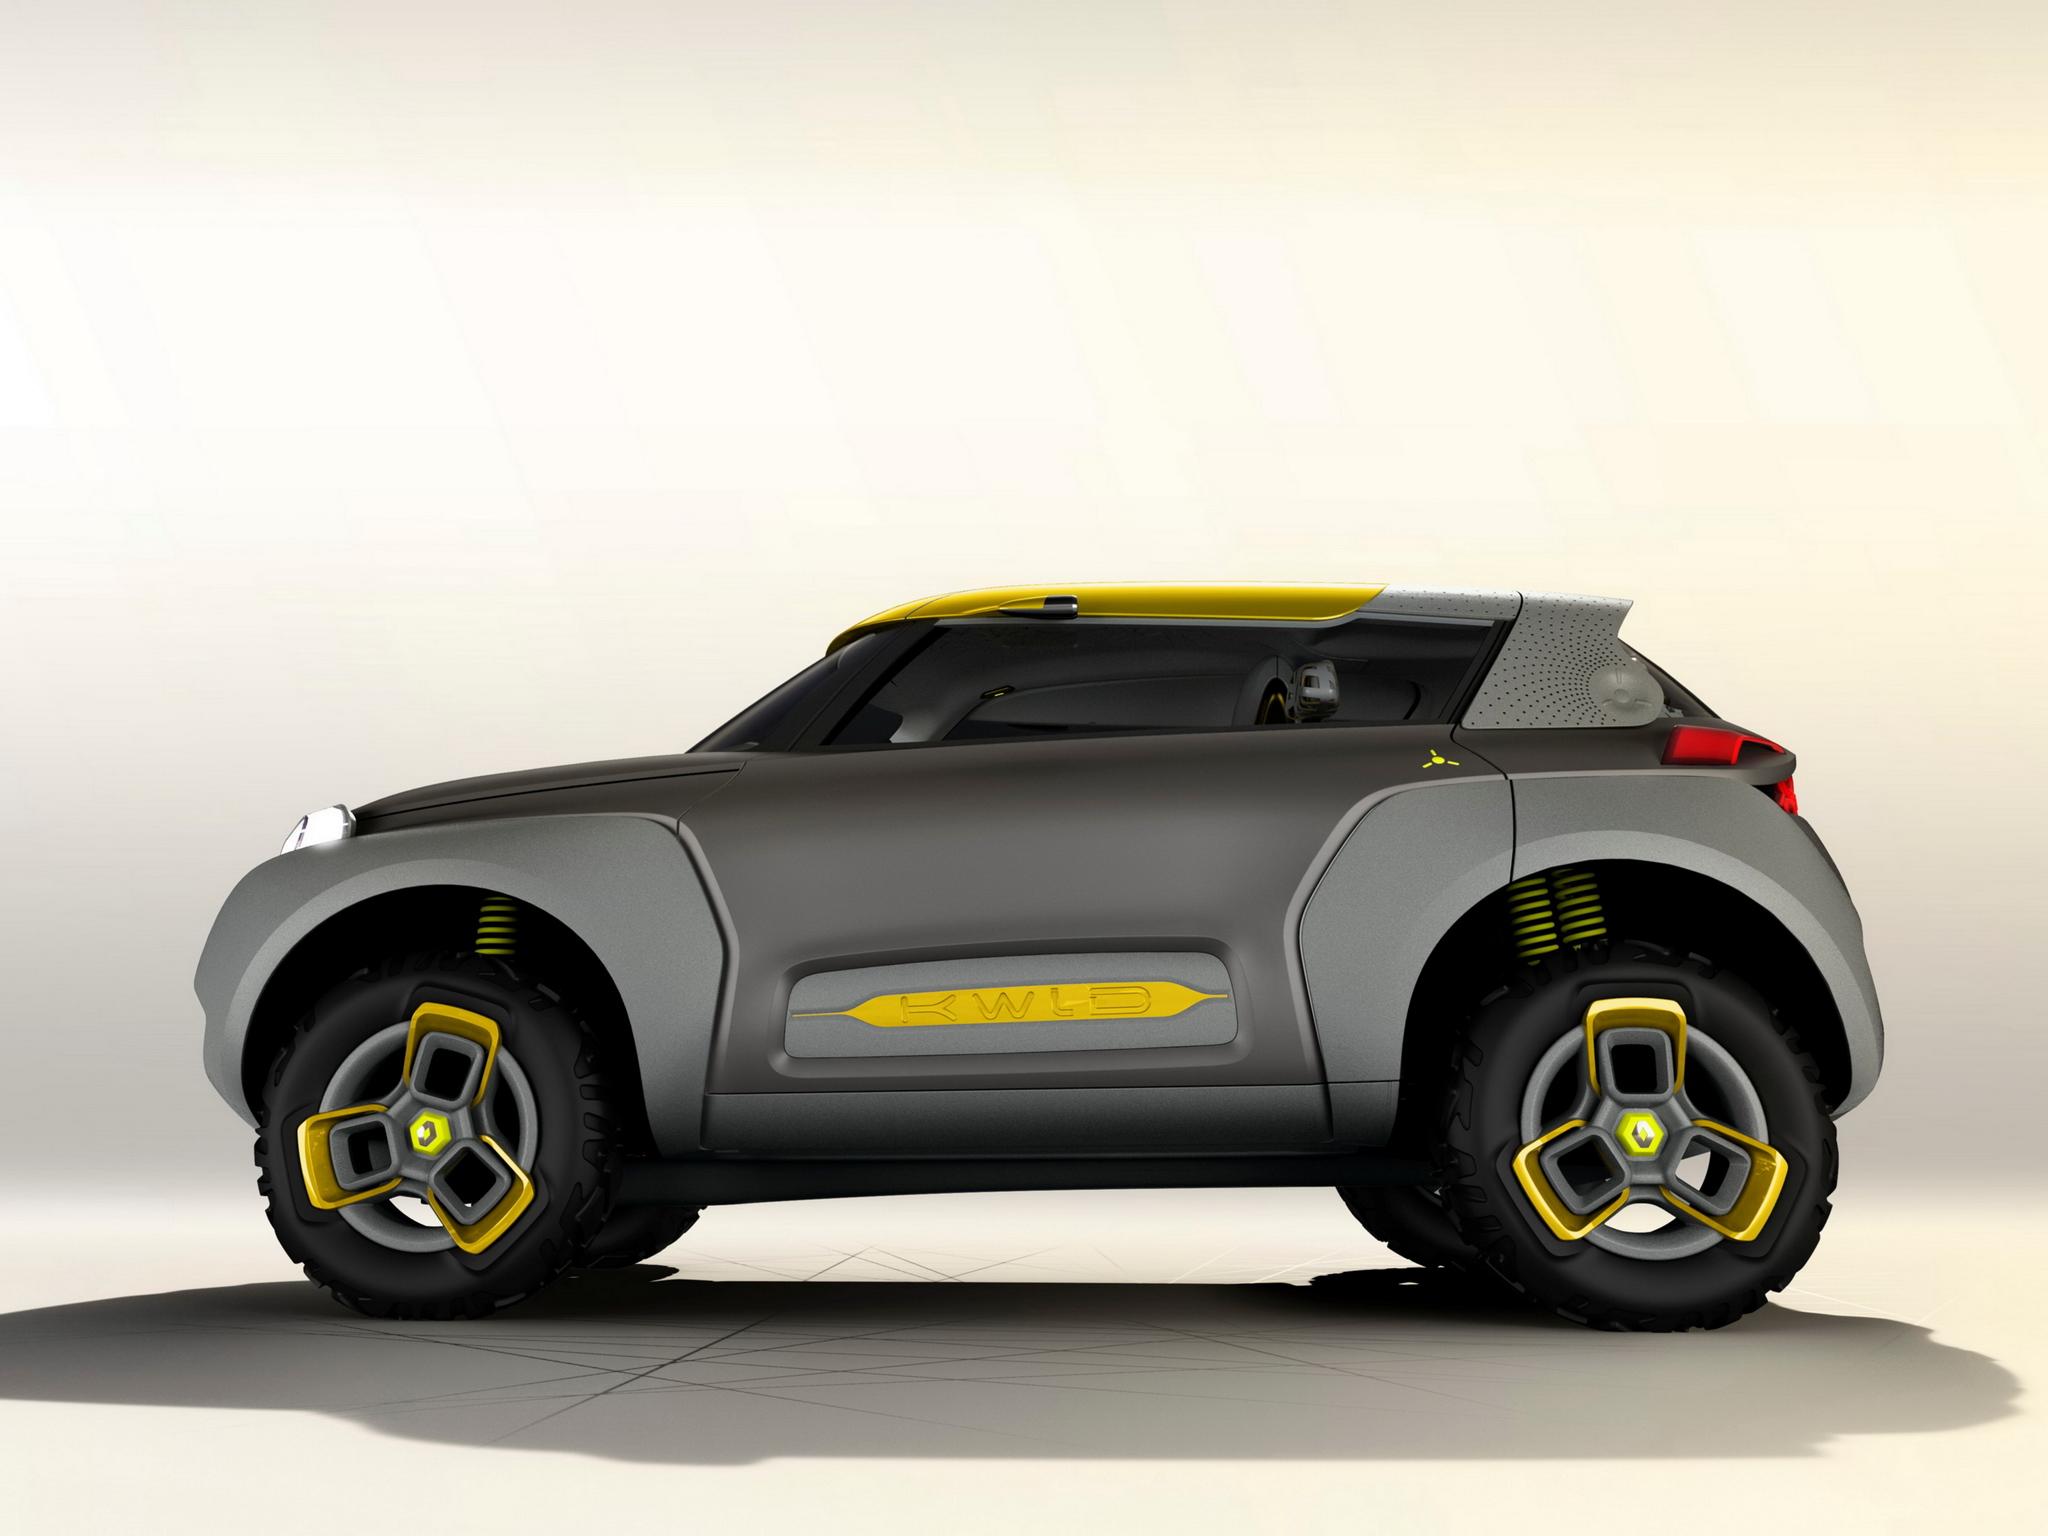 Renault Kwid concept 2014 - profil / side-face